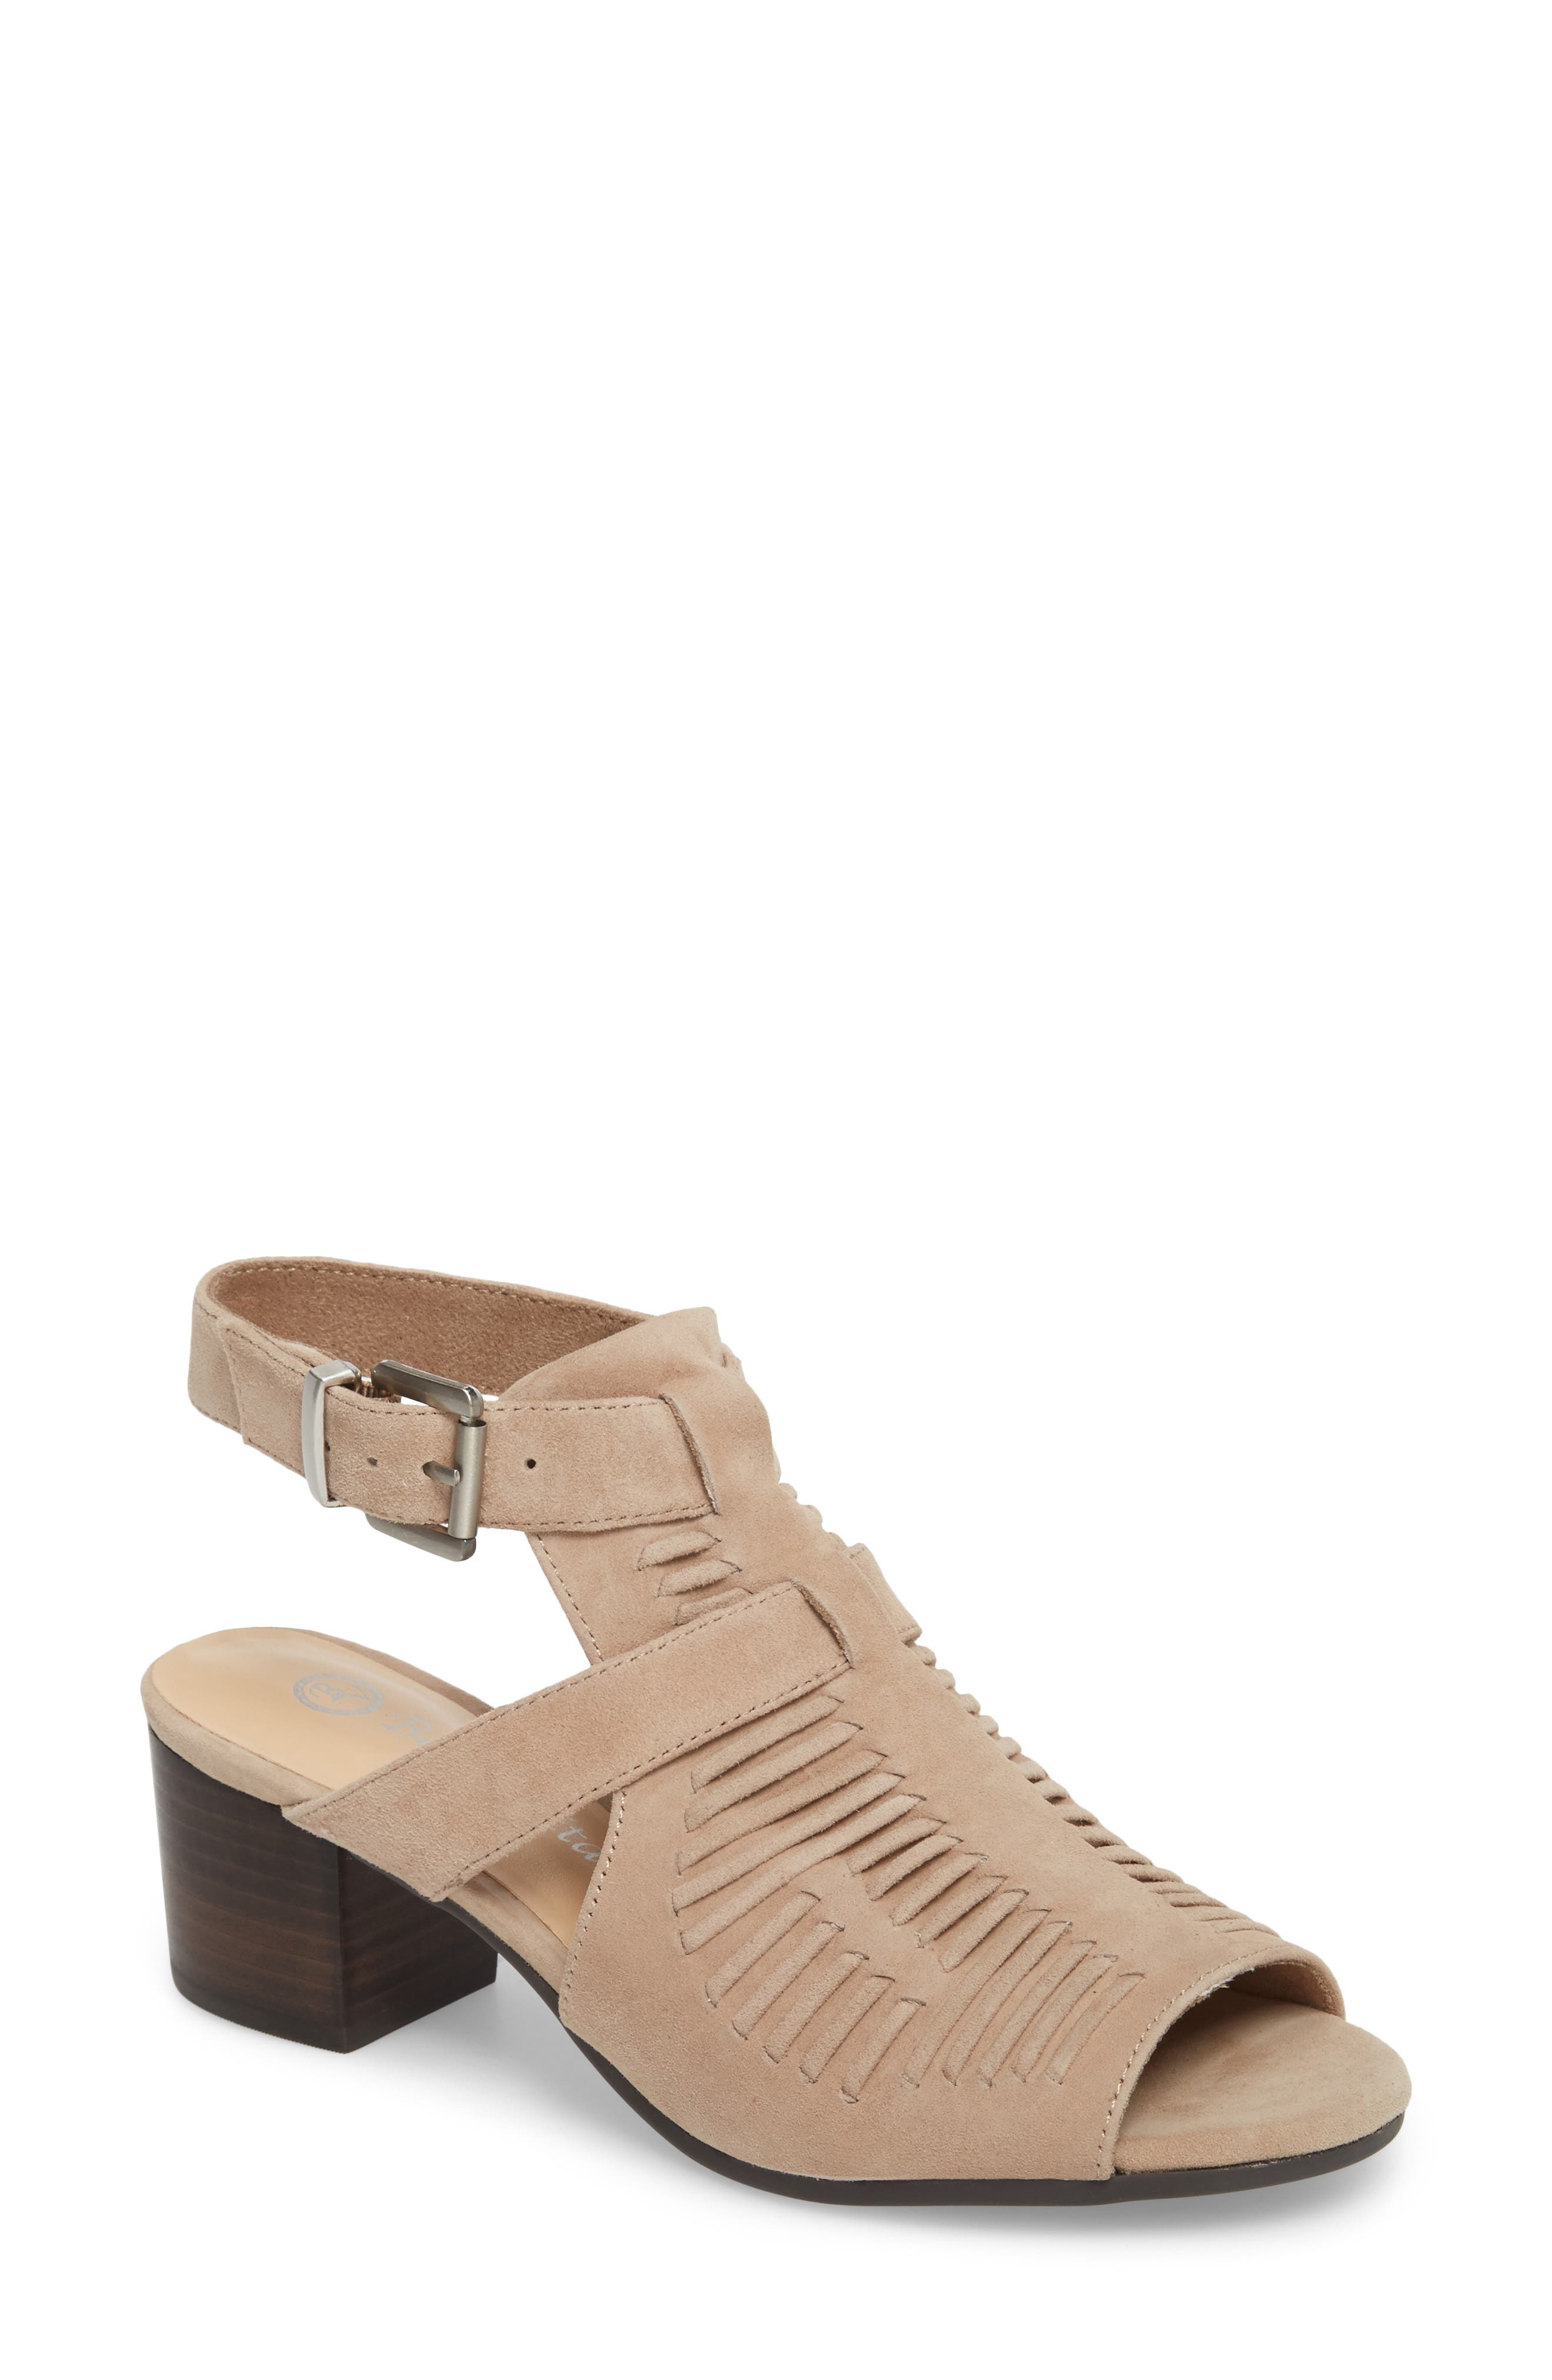 Finley Ankle Strap Sandal,                             Main thumbnail 4, color,